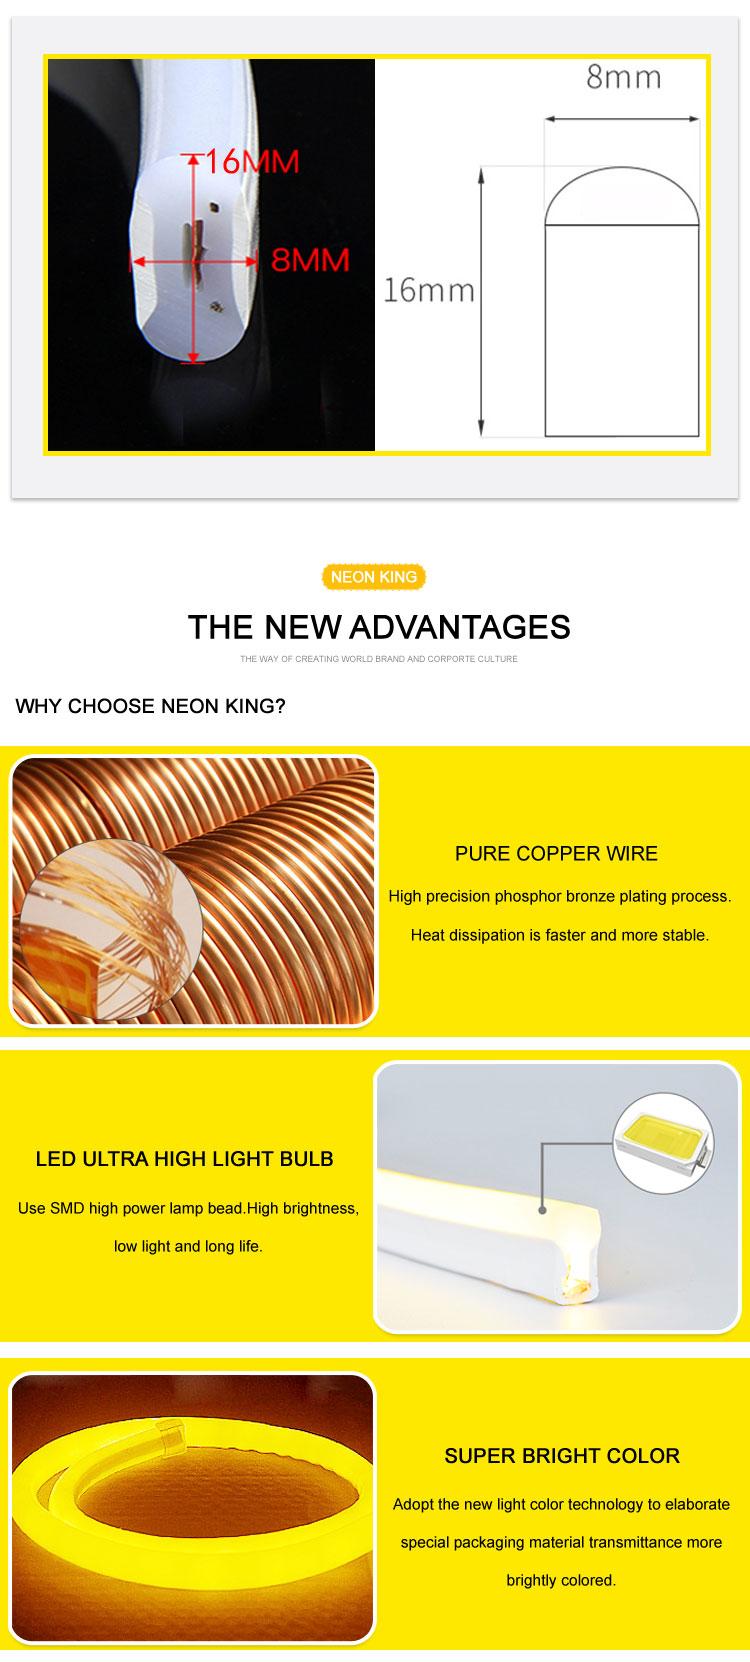 Neon King Ltd